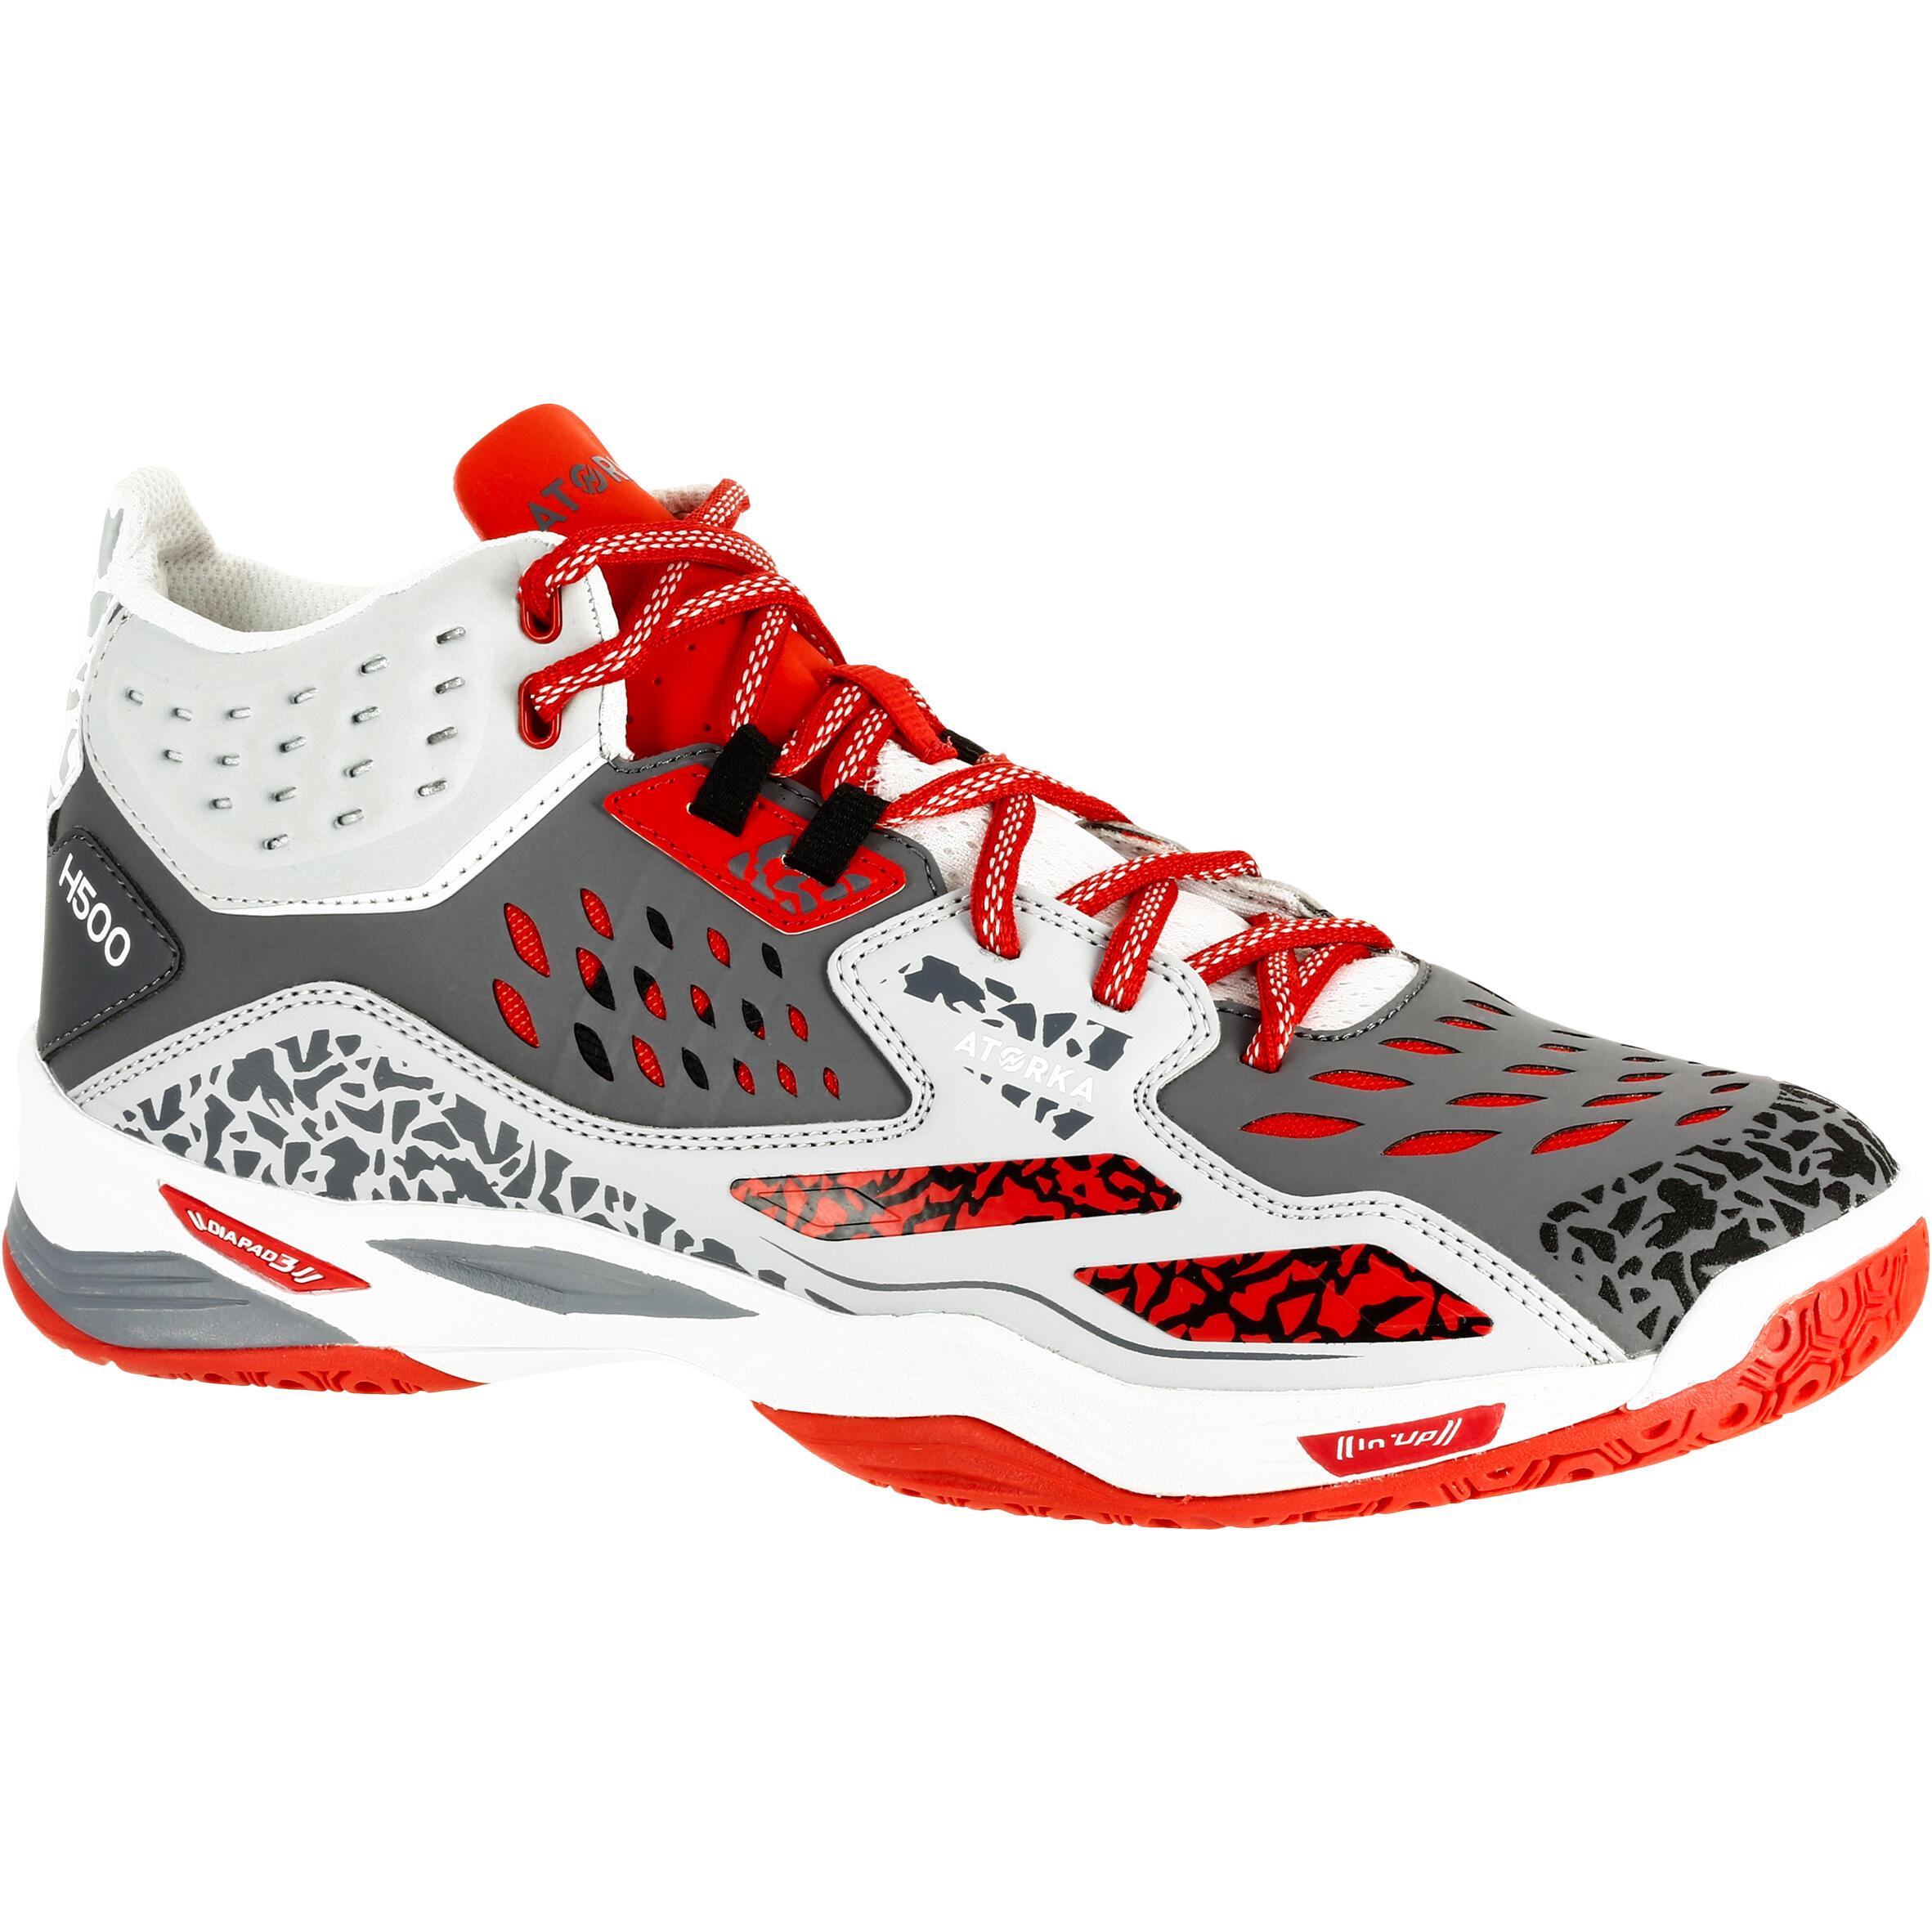 Handballschuhe H500 Mid Herren grau/rot | Schuhe > Sportschuhe > Handballschuhe | Atorka